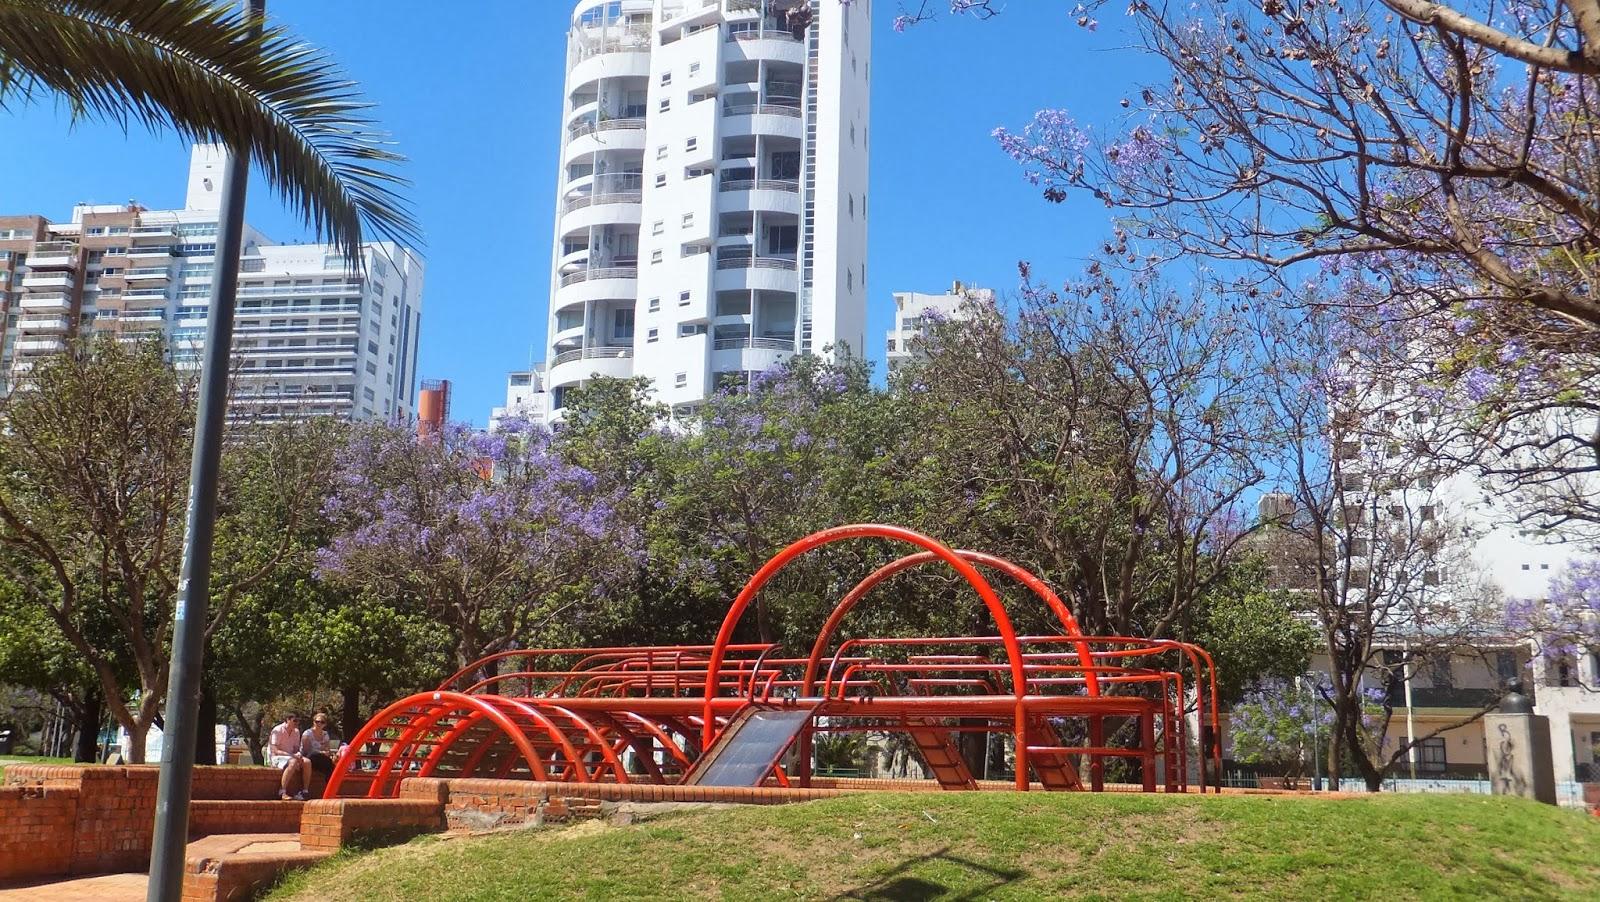 Parque España, Rosario, Argentina, lisa N, Blog de Viajes, Lifestyle, Travel